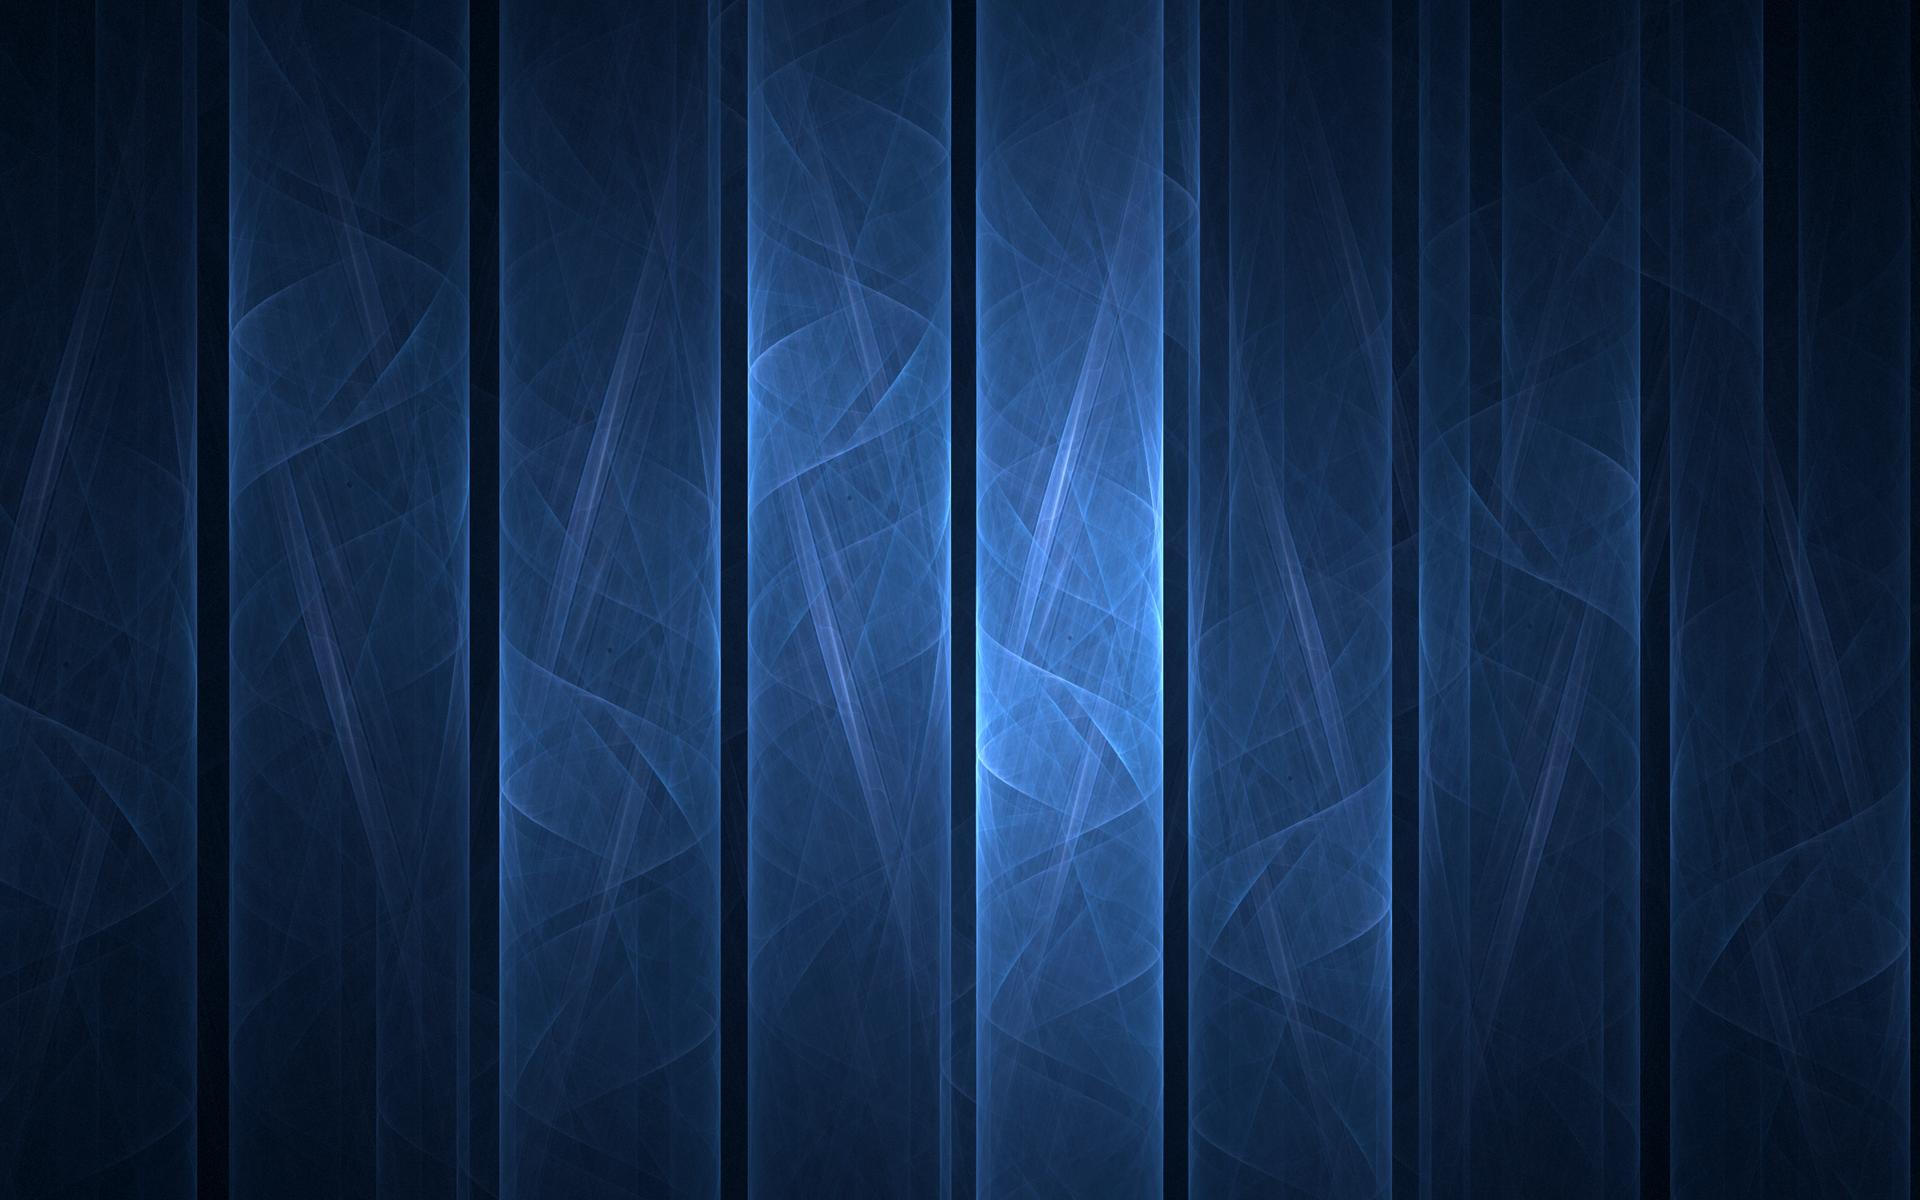 Smokey Blue Stripes Abstract Hd Wallpaper 1920x1200 5690